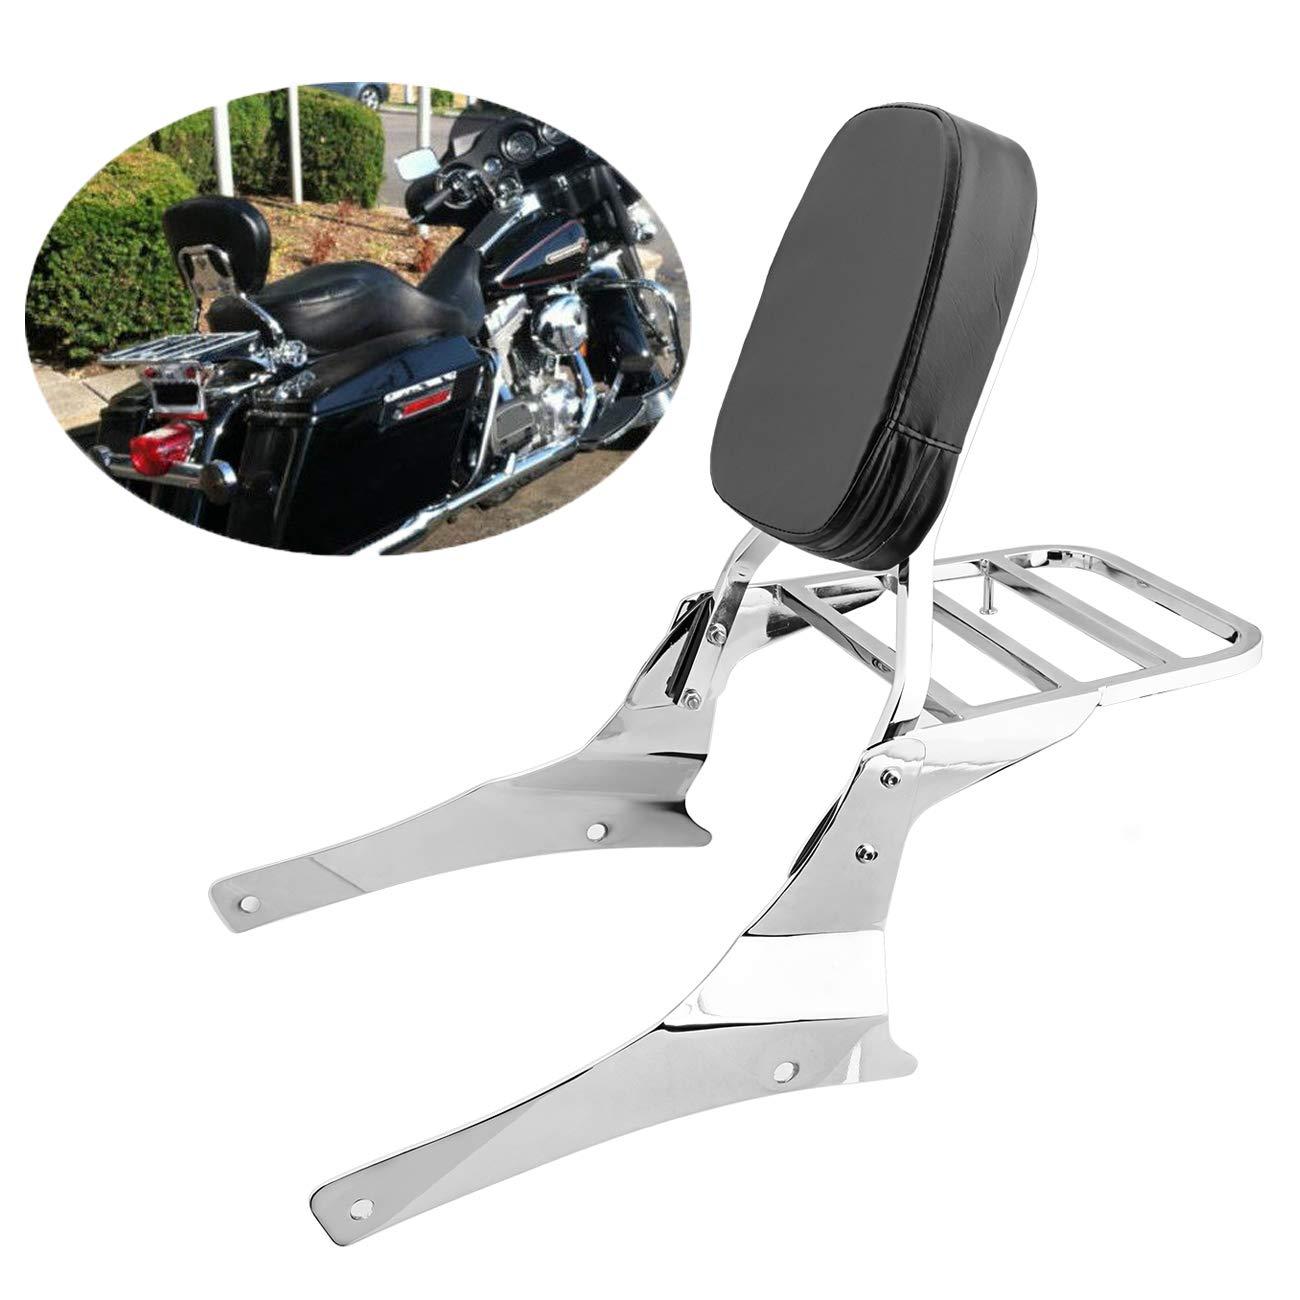 Samger Motorcycle Passenger Sissy Bar Luggage Rear Rack Backrest